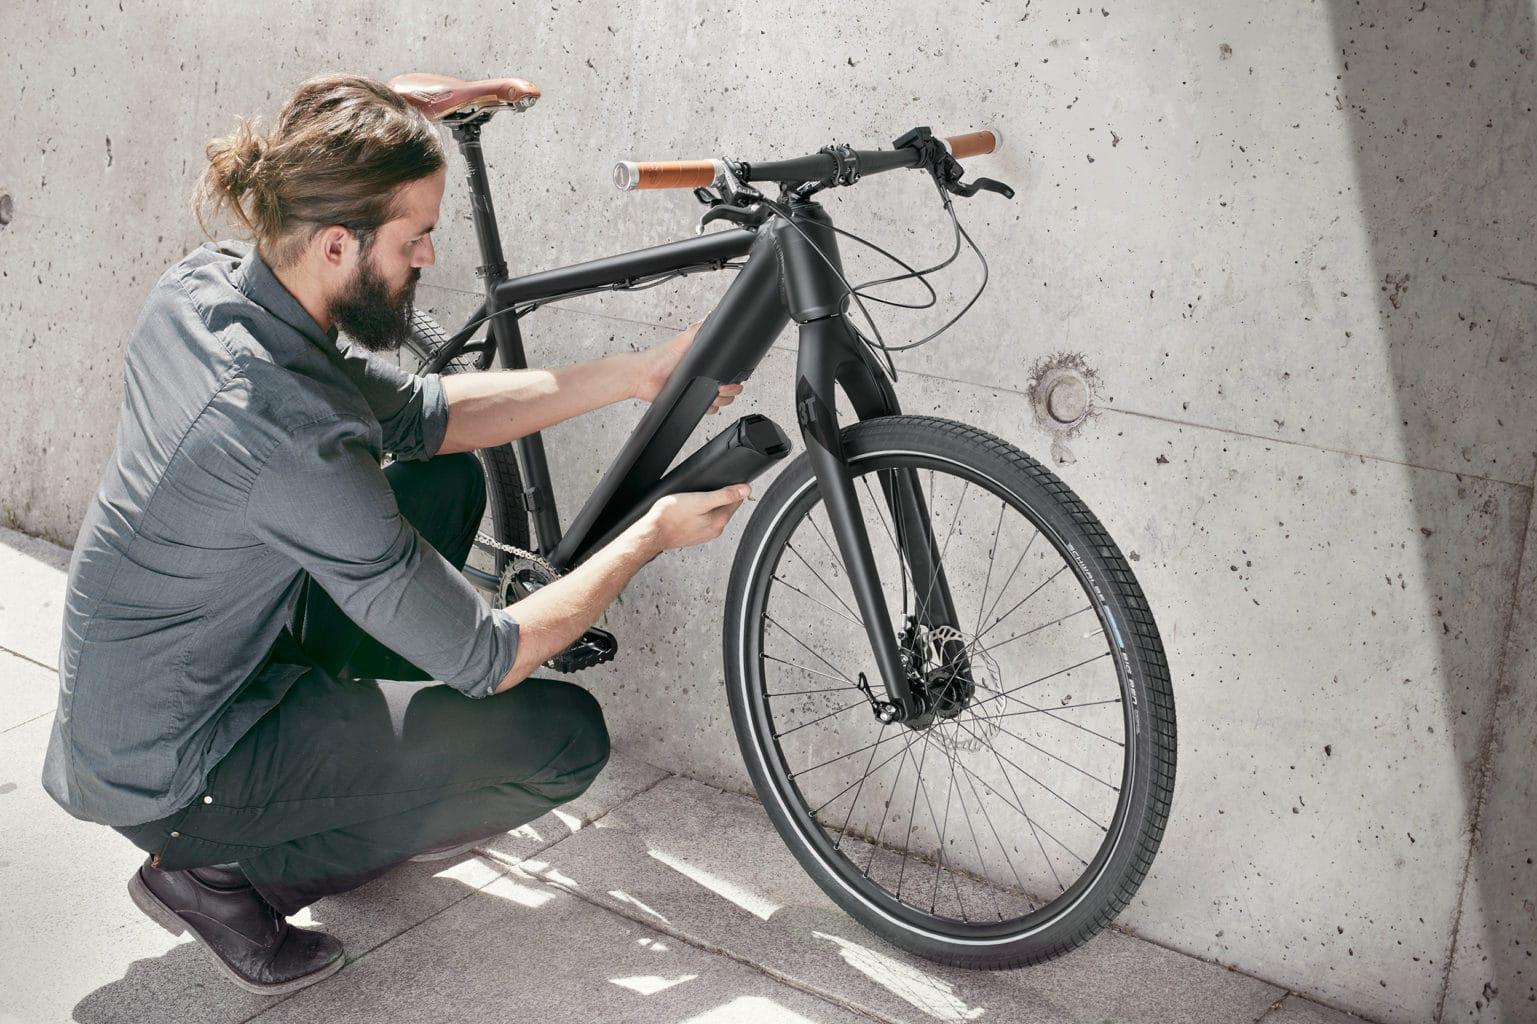 E-Bike Akku geklaut?!